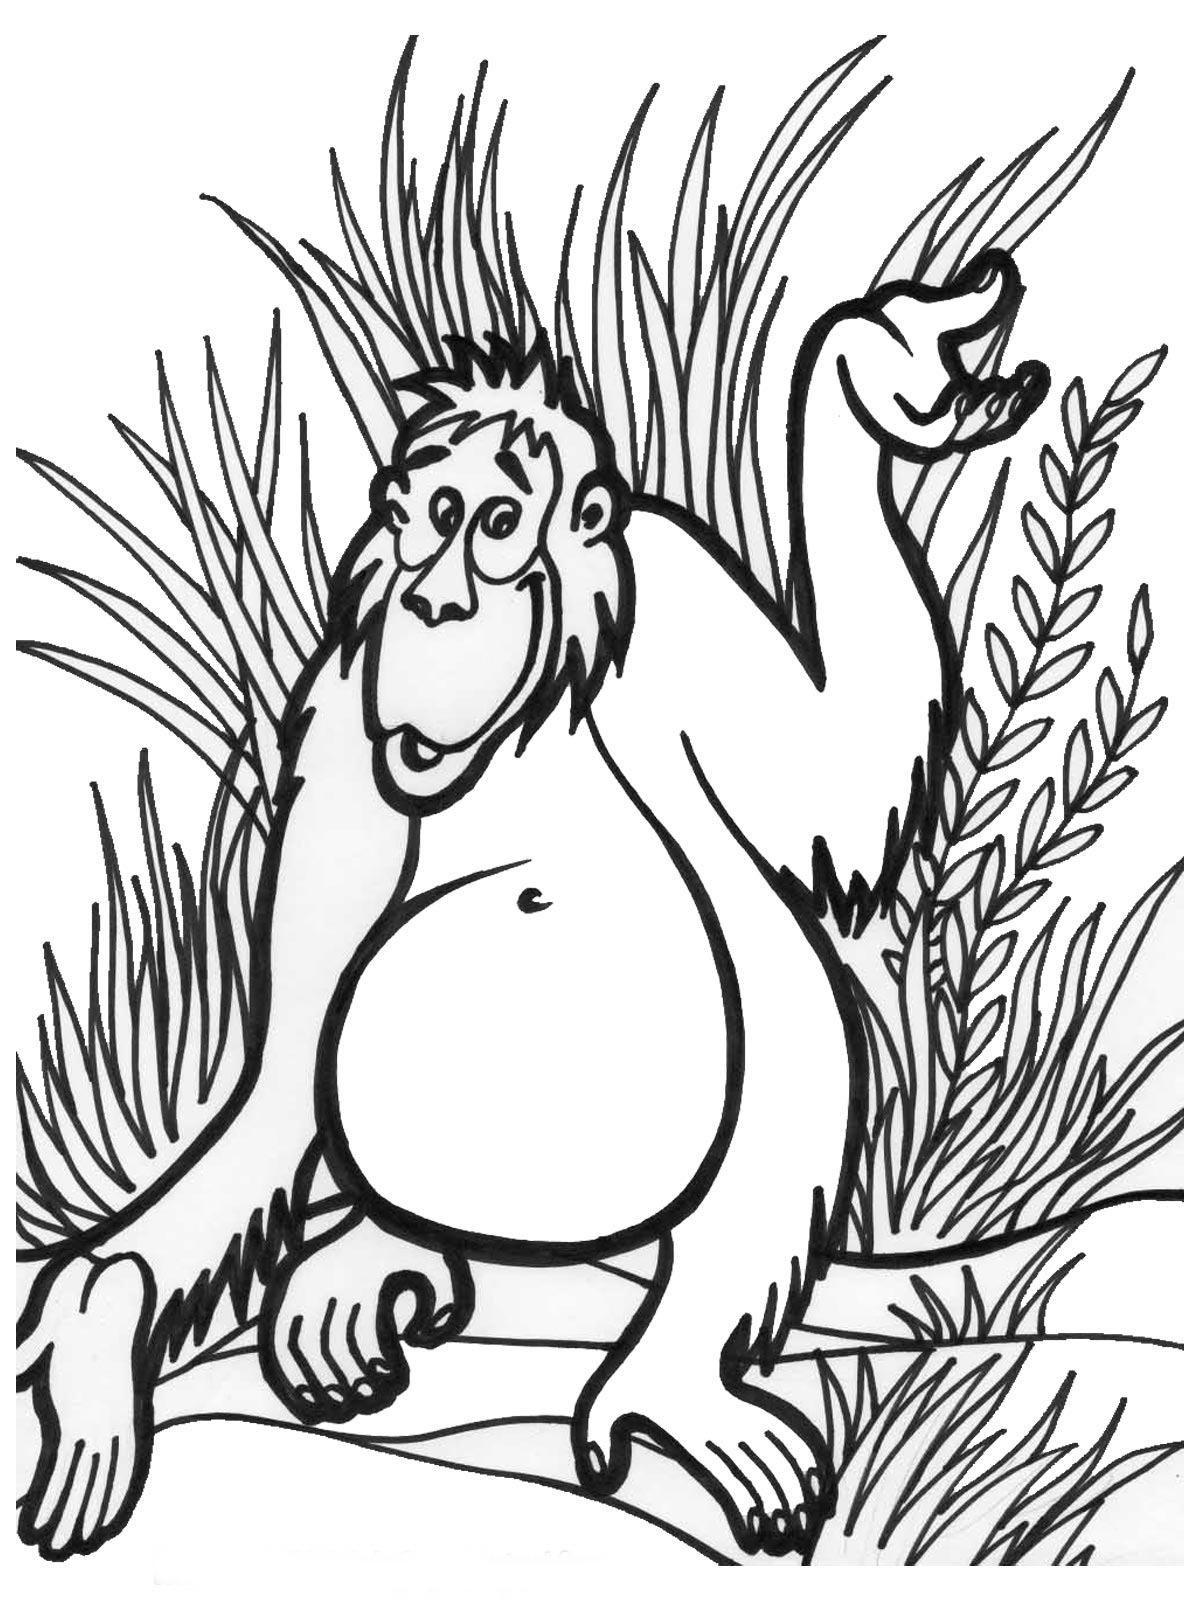 Printable coloring pages jungle - Rainforest Coloring Pages Picture Printable Rarest Animal Jungle